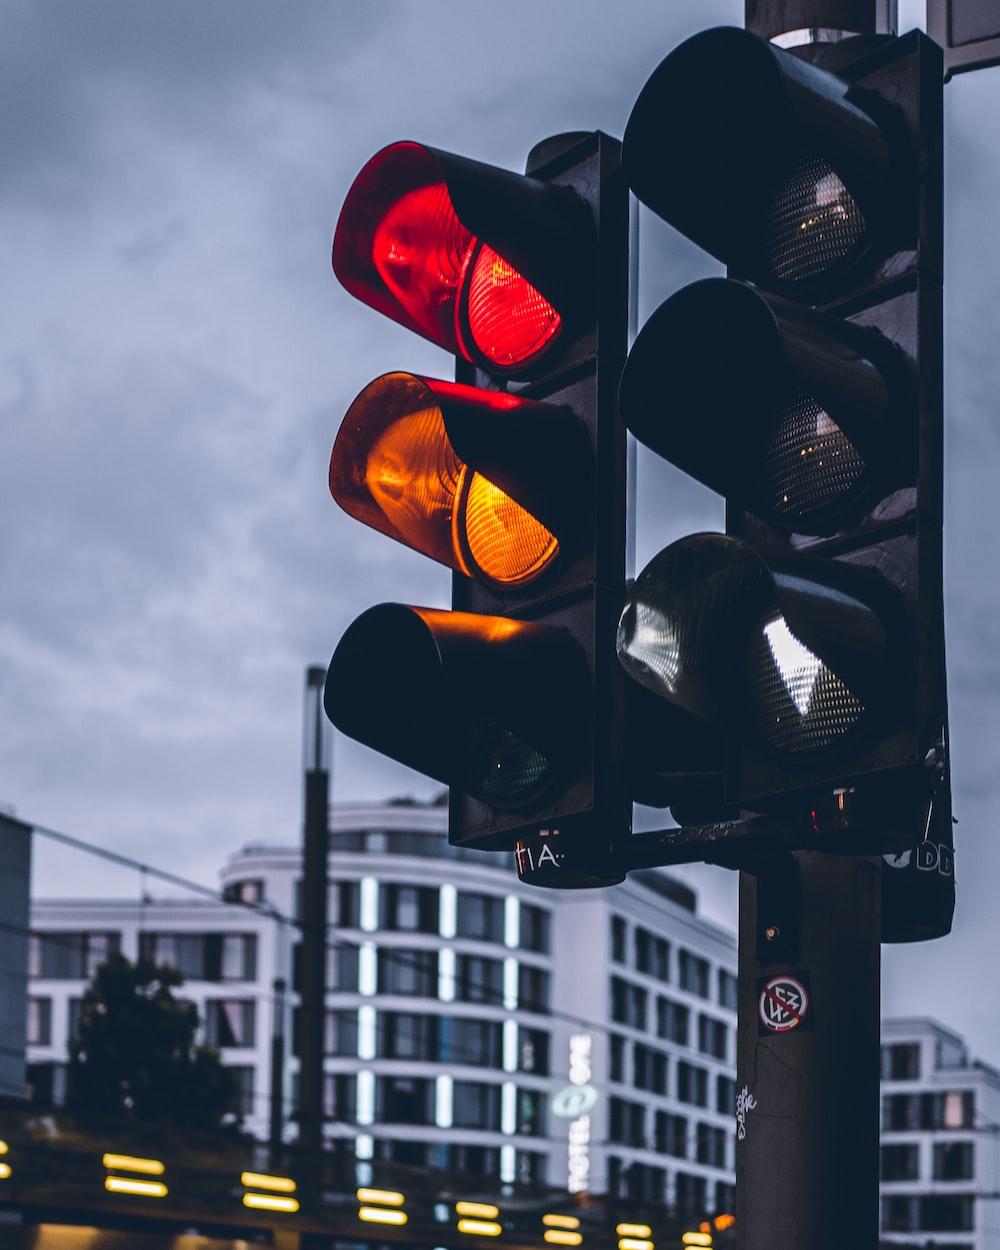 street traffic lights on red and orange